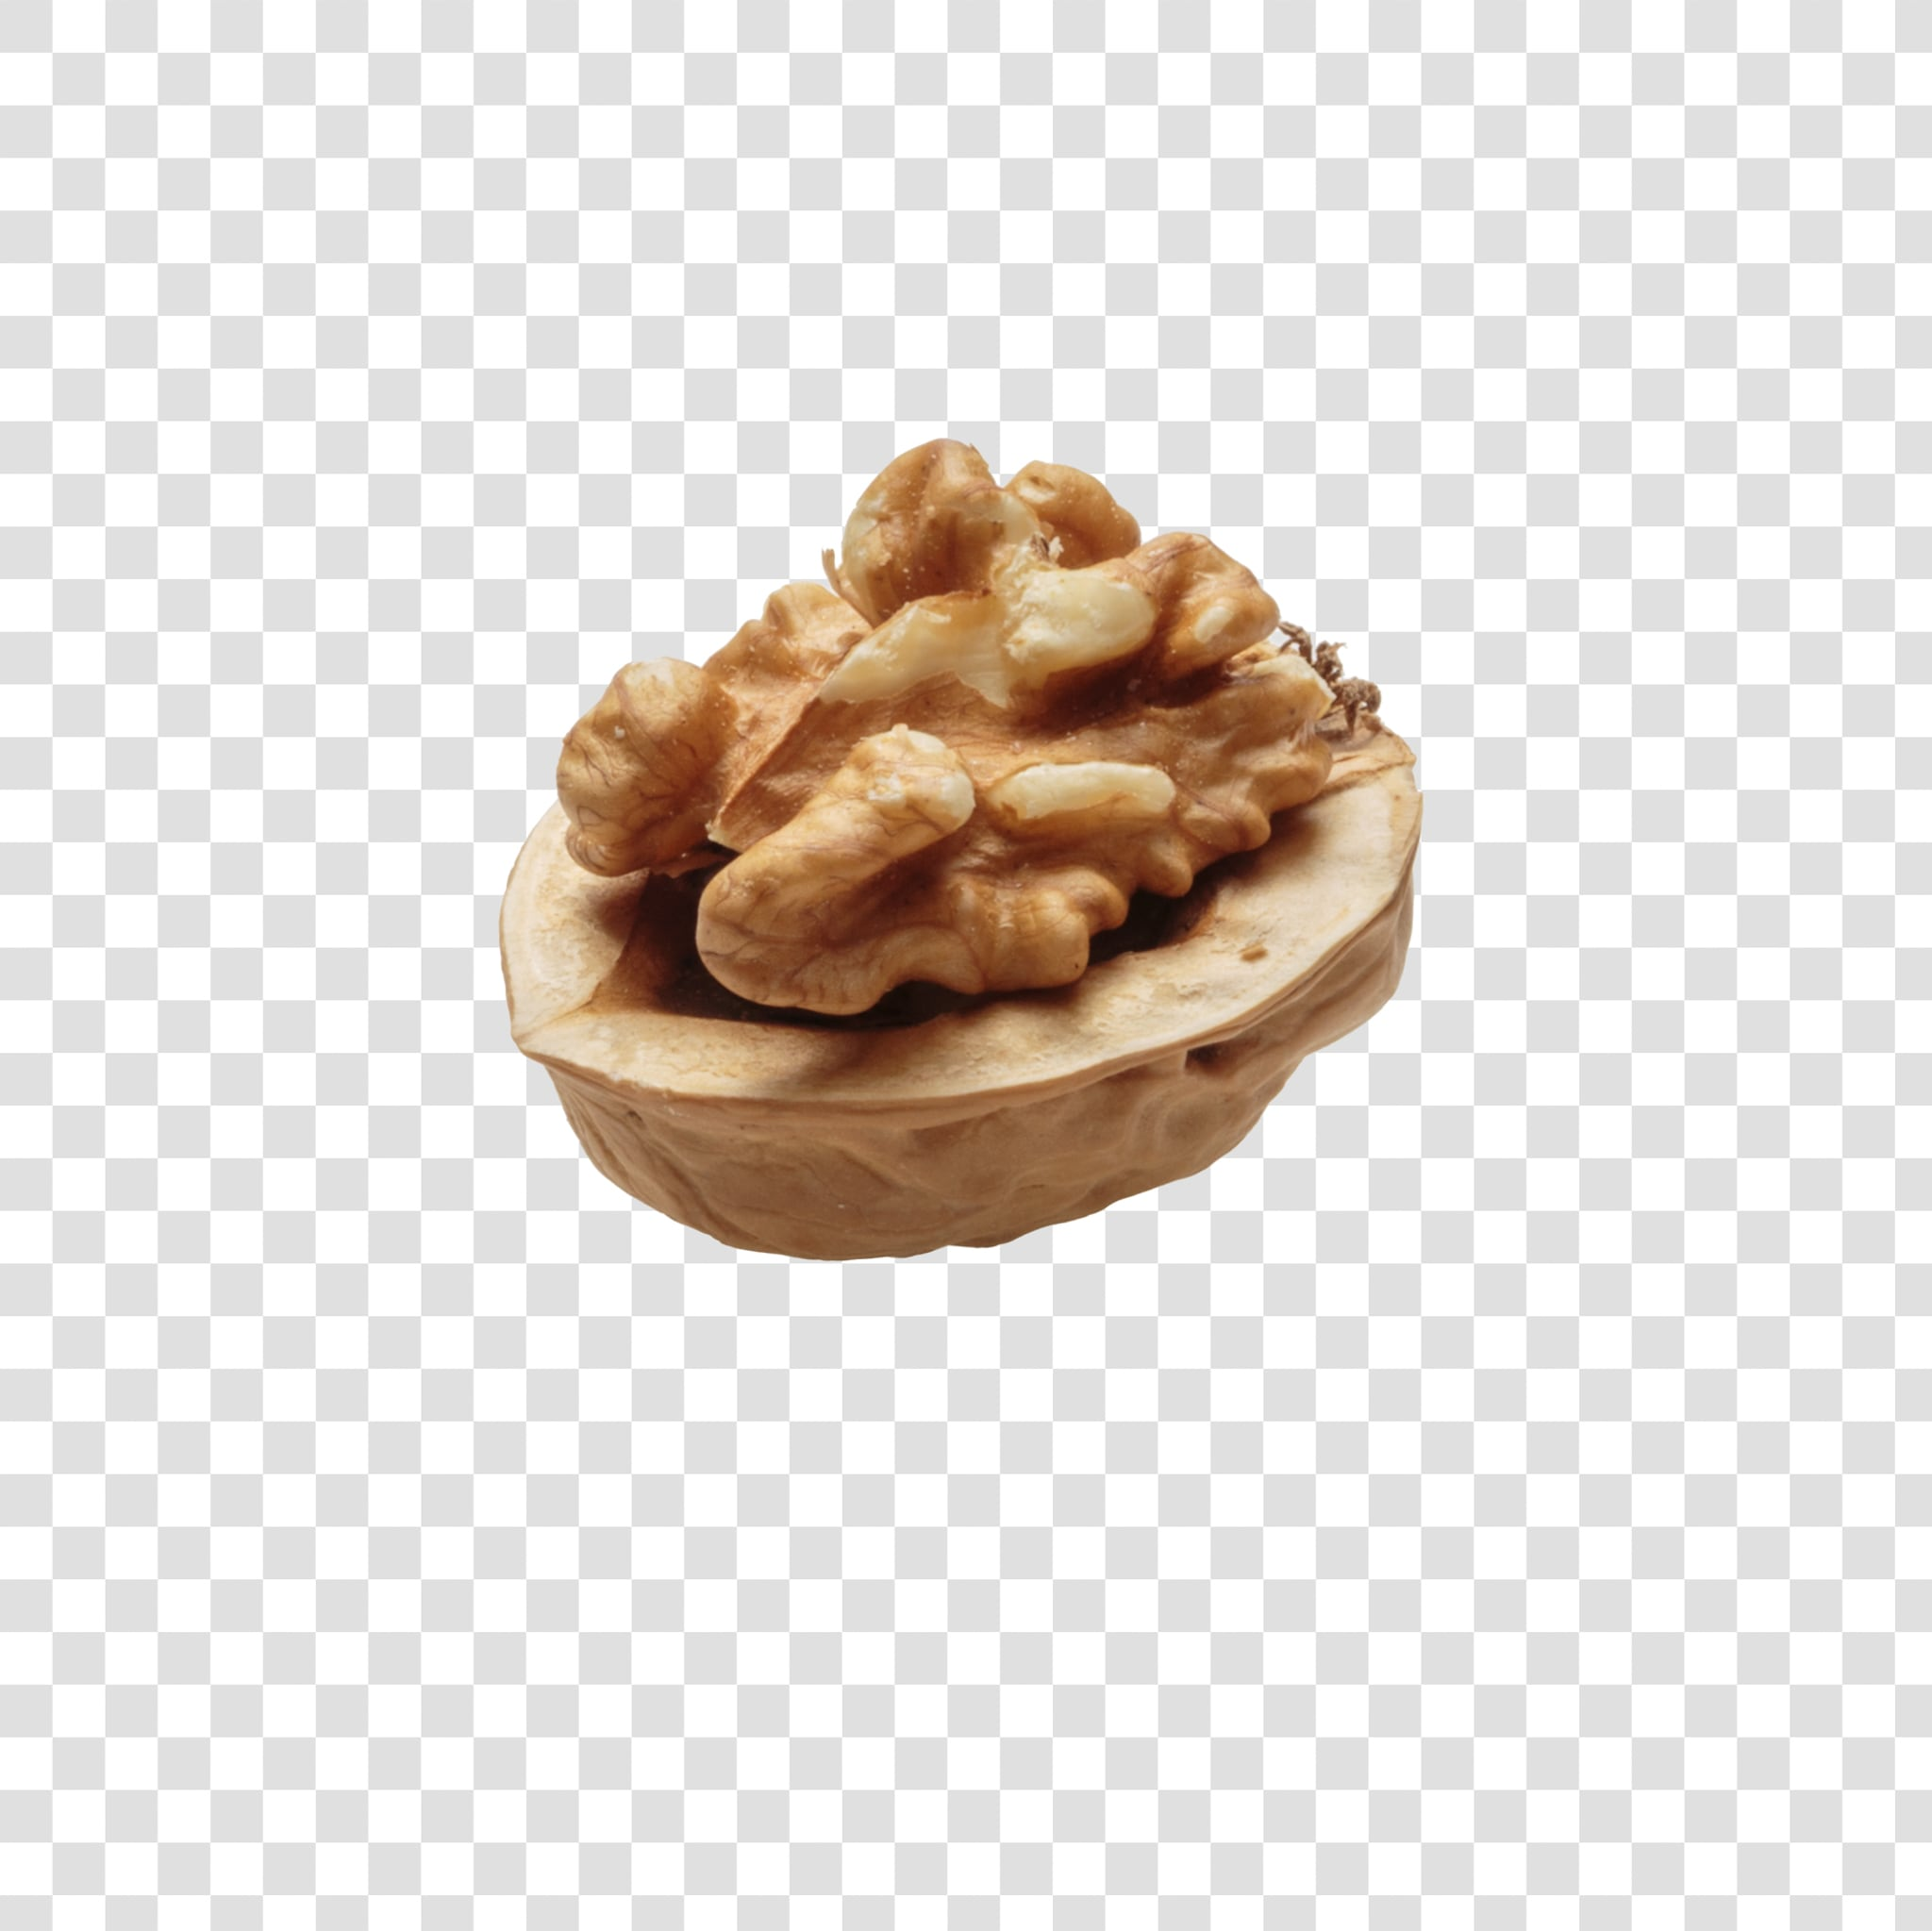 Walnut PSD layered image